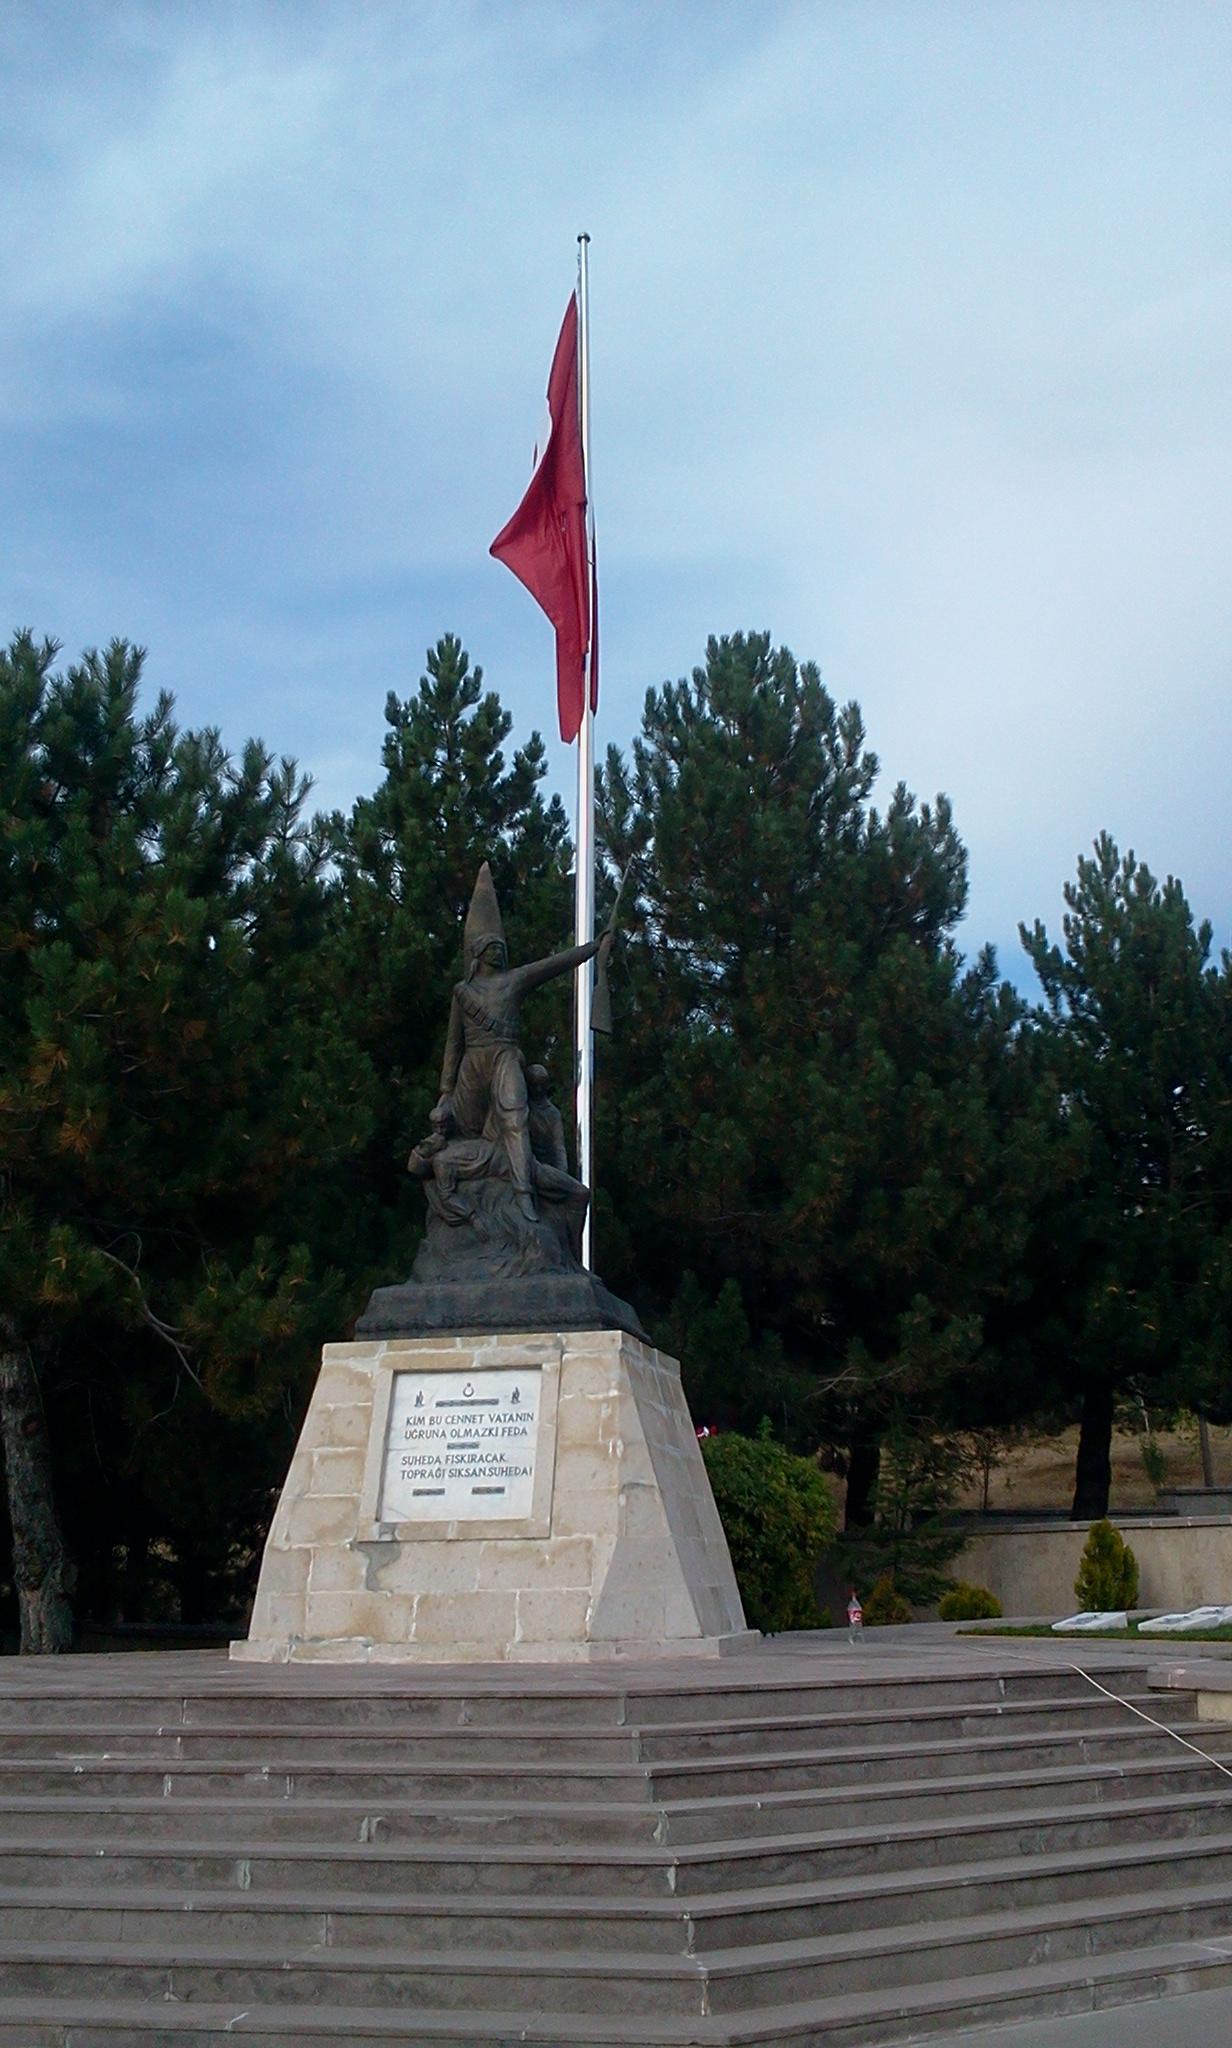 Afyon Kocatepe Paslanmaz Bayrak Direği